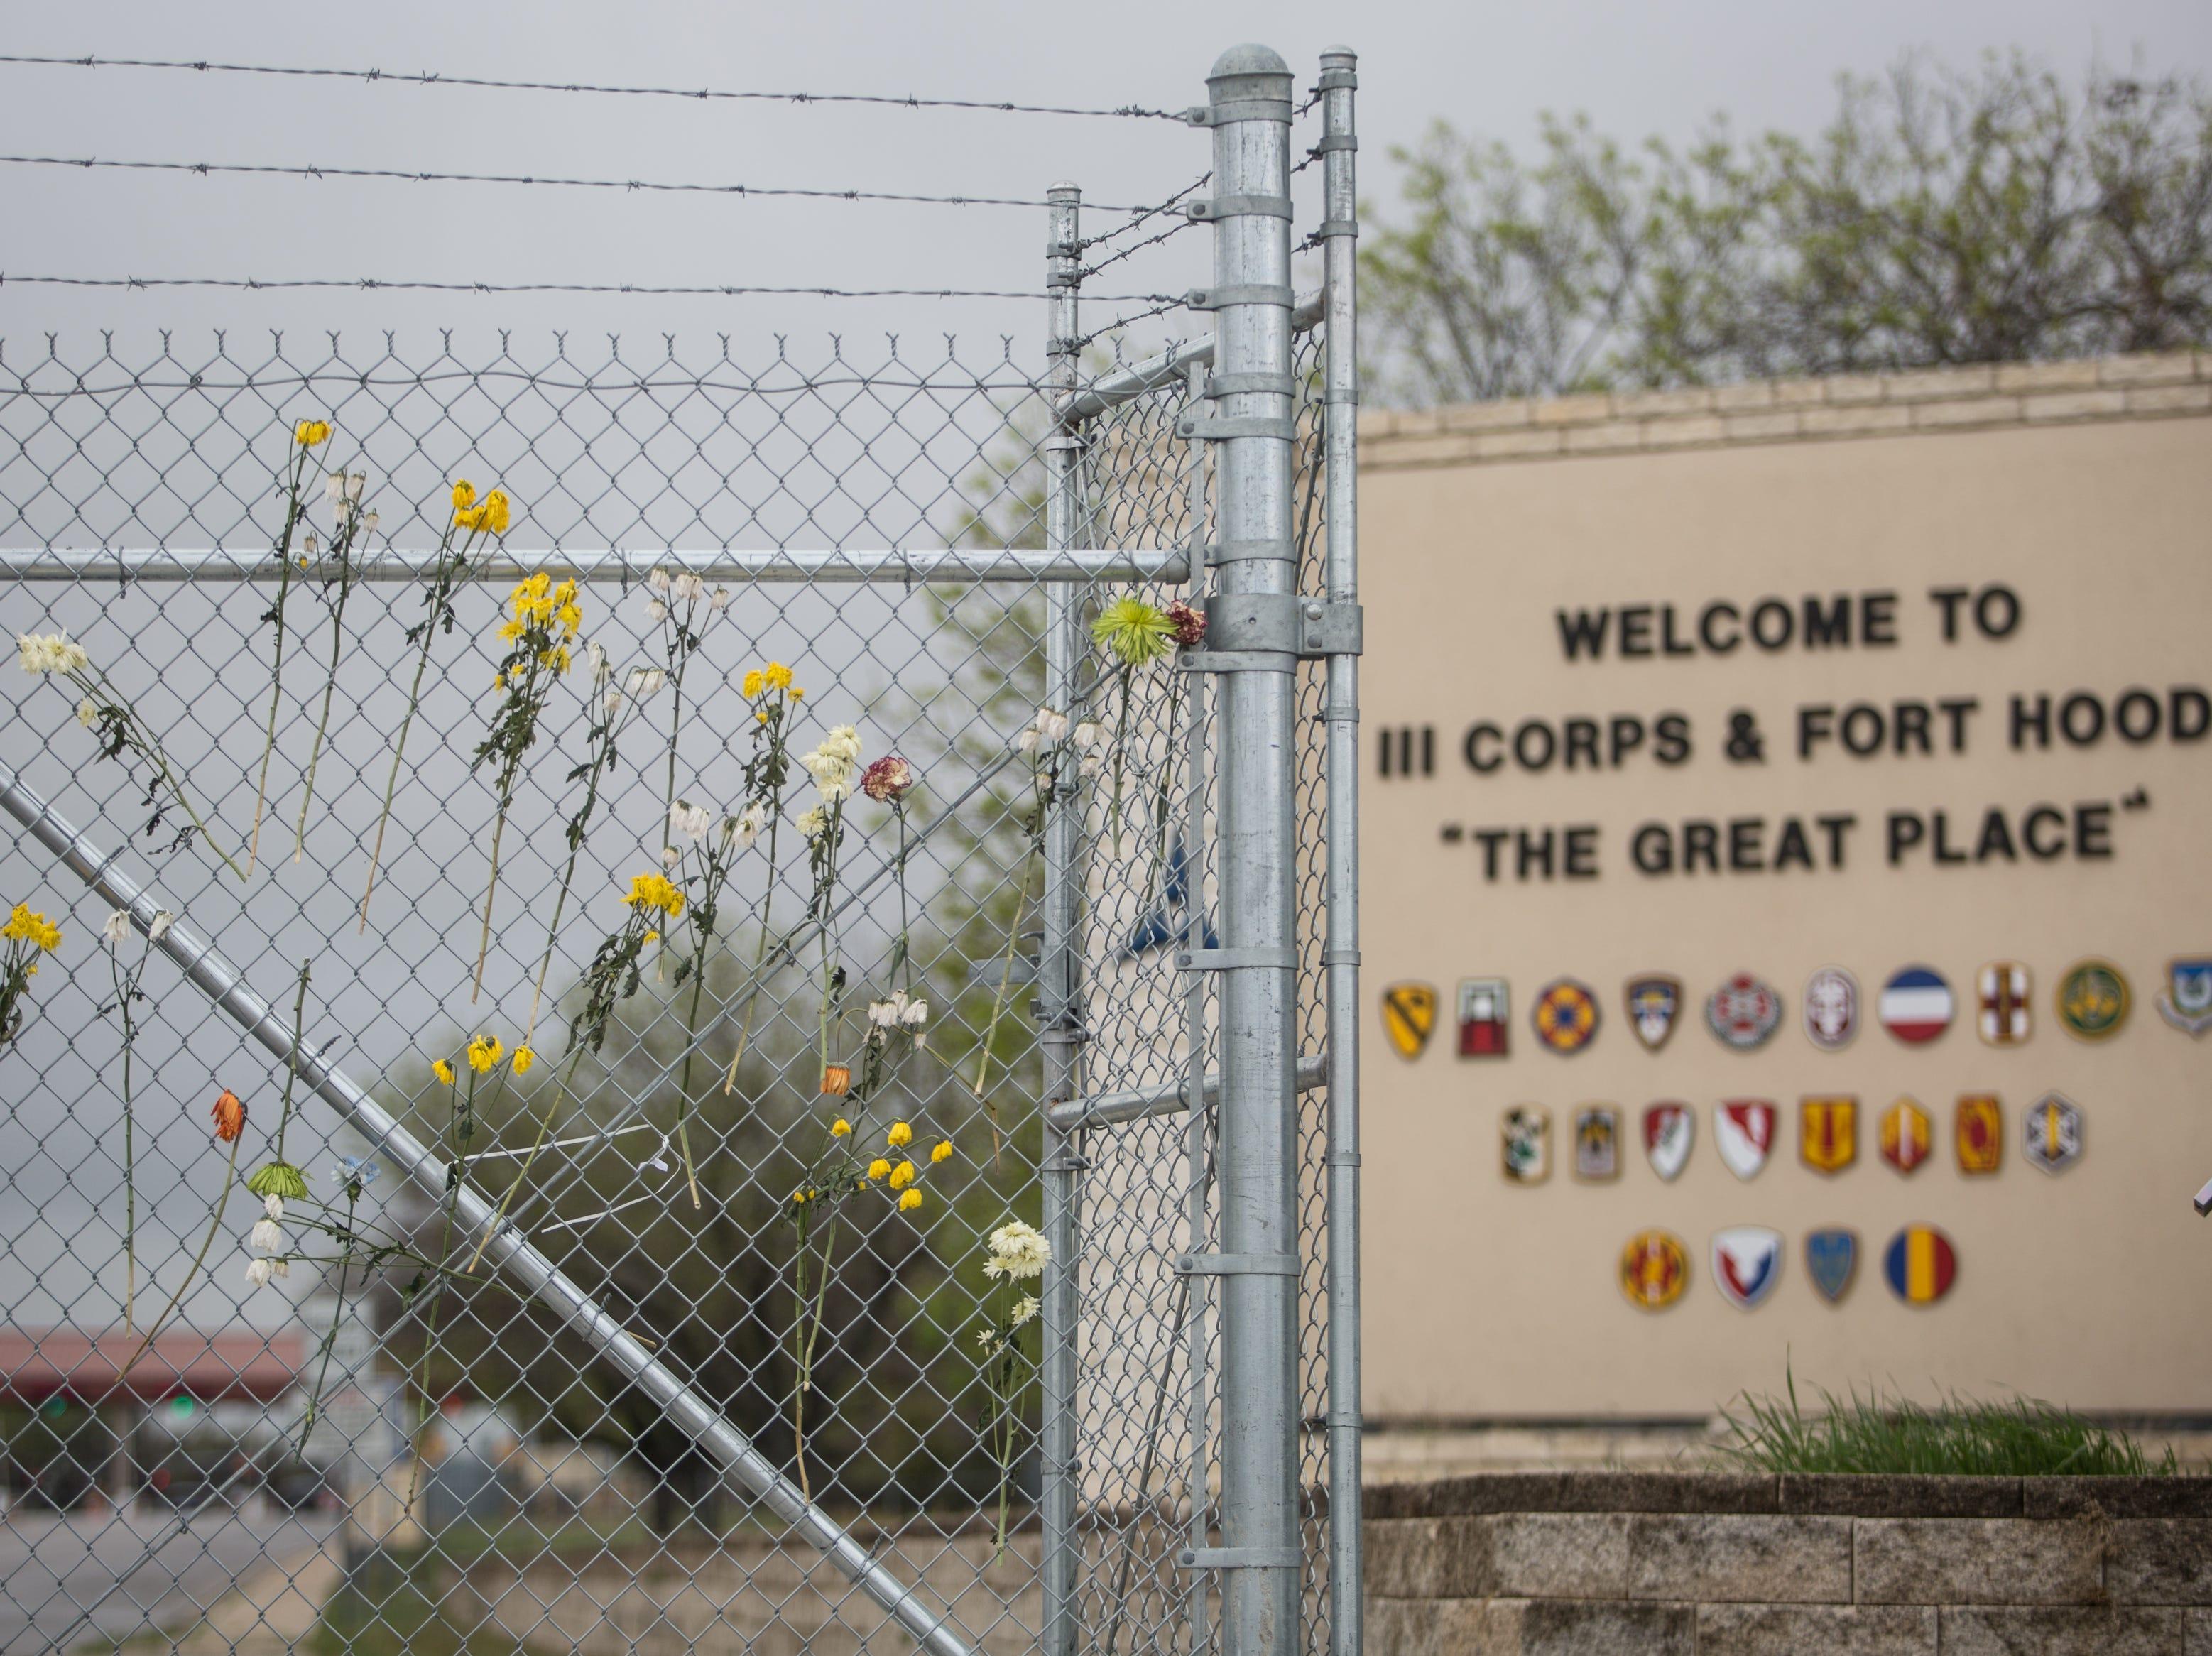 Fort Hood   near Killeen, Texas   Nov. 5, 2009   14 dead   32 wounded